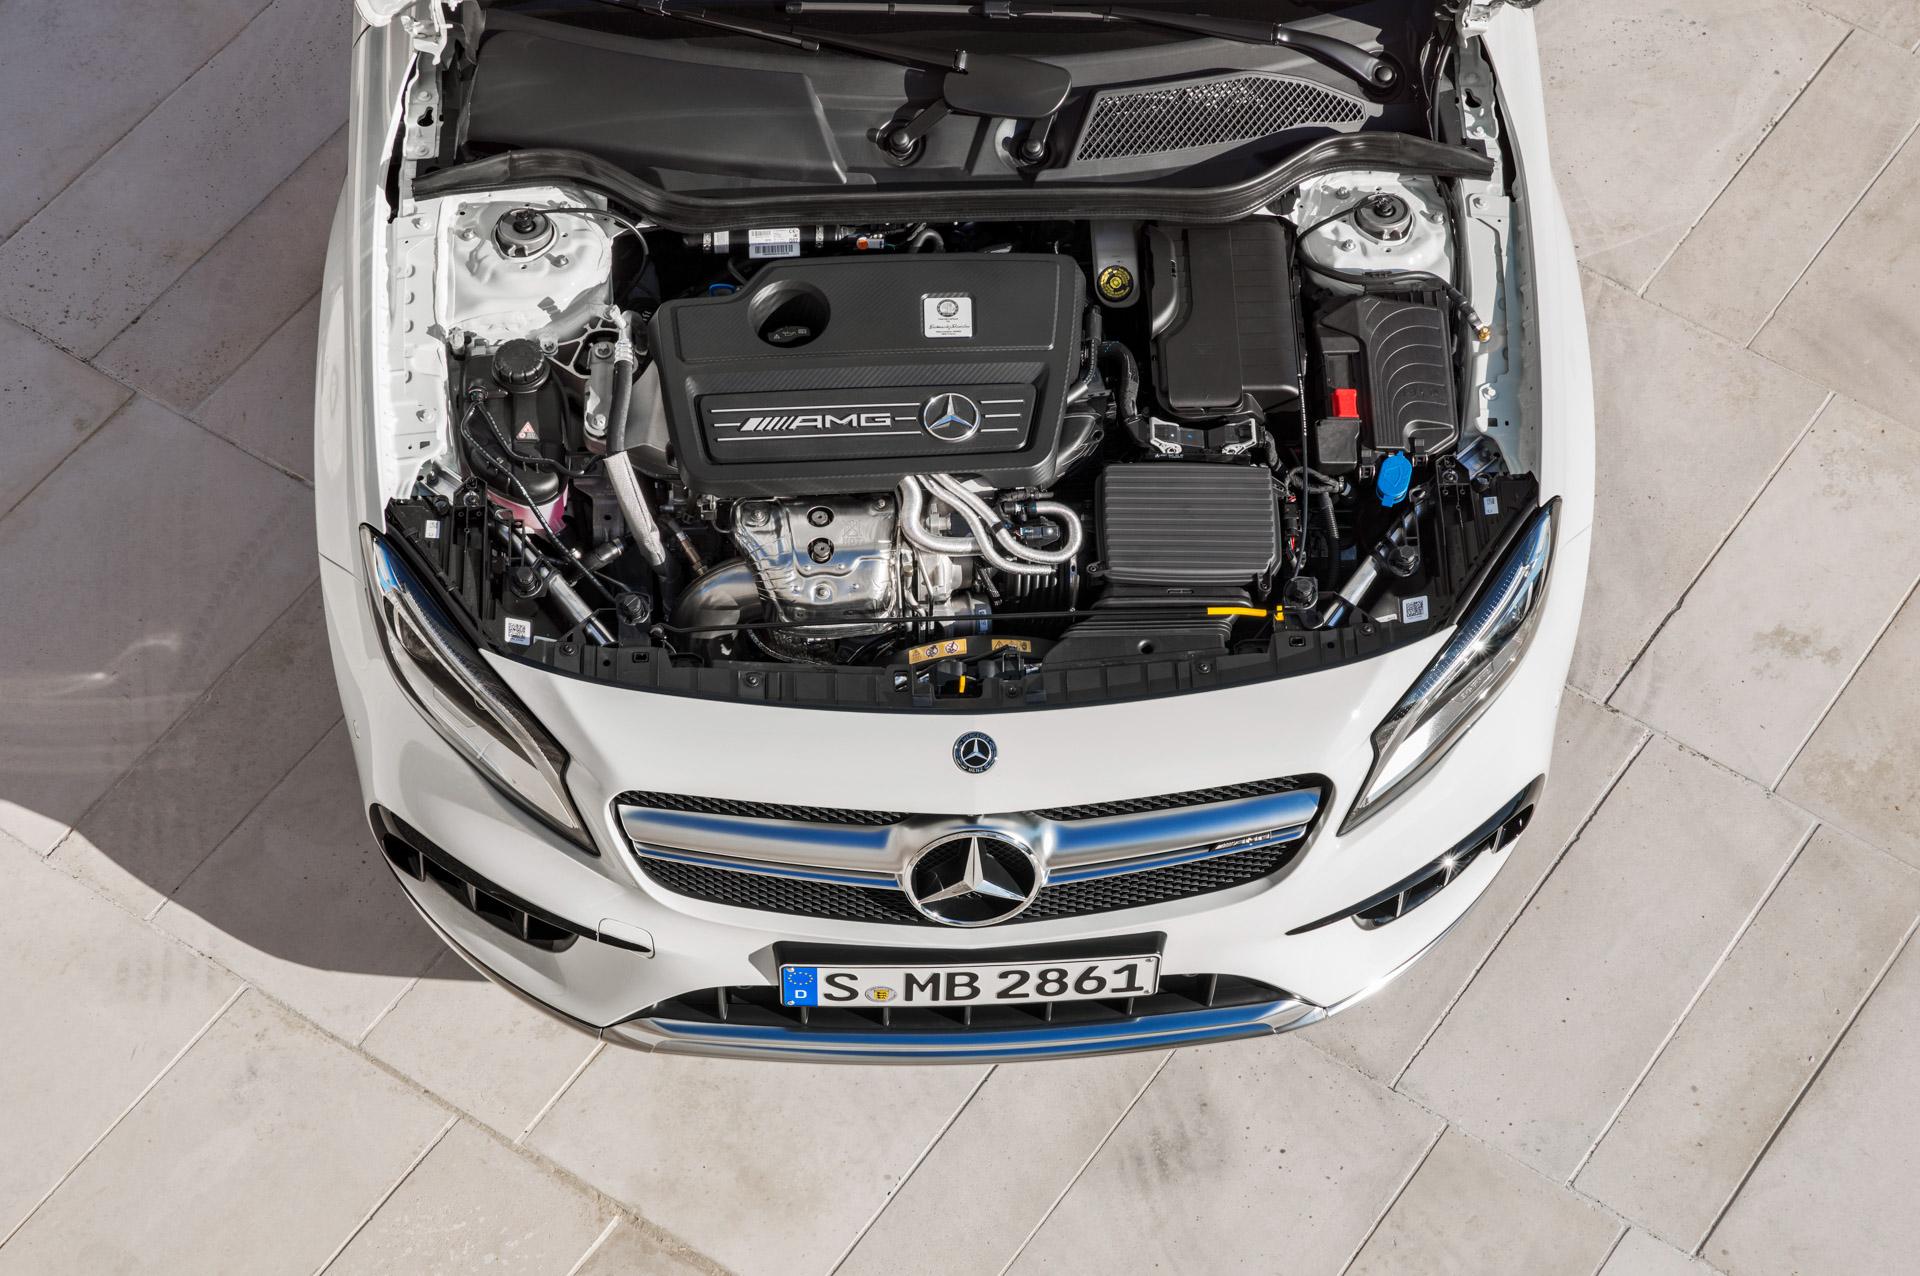 Mercedes-AMG GLA 45 4MATIC, Motor, 280 kW (381 PS) ;Kraftstoffverbrauch kombiniert: 7,4 l/100 km, CO2-Emissionen kombiniert: 172 g/km Mercedes-AMG GLA 45 4MATIC, engine, 280 kW (381 PS); Fuel consumption combined:  7,4 l/100 km; Combined CO2 emissions: 172 g/km